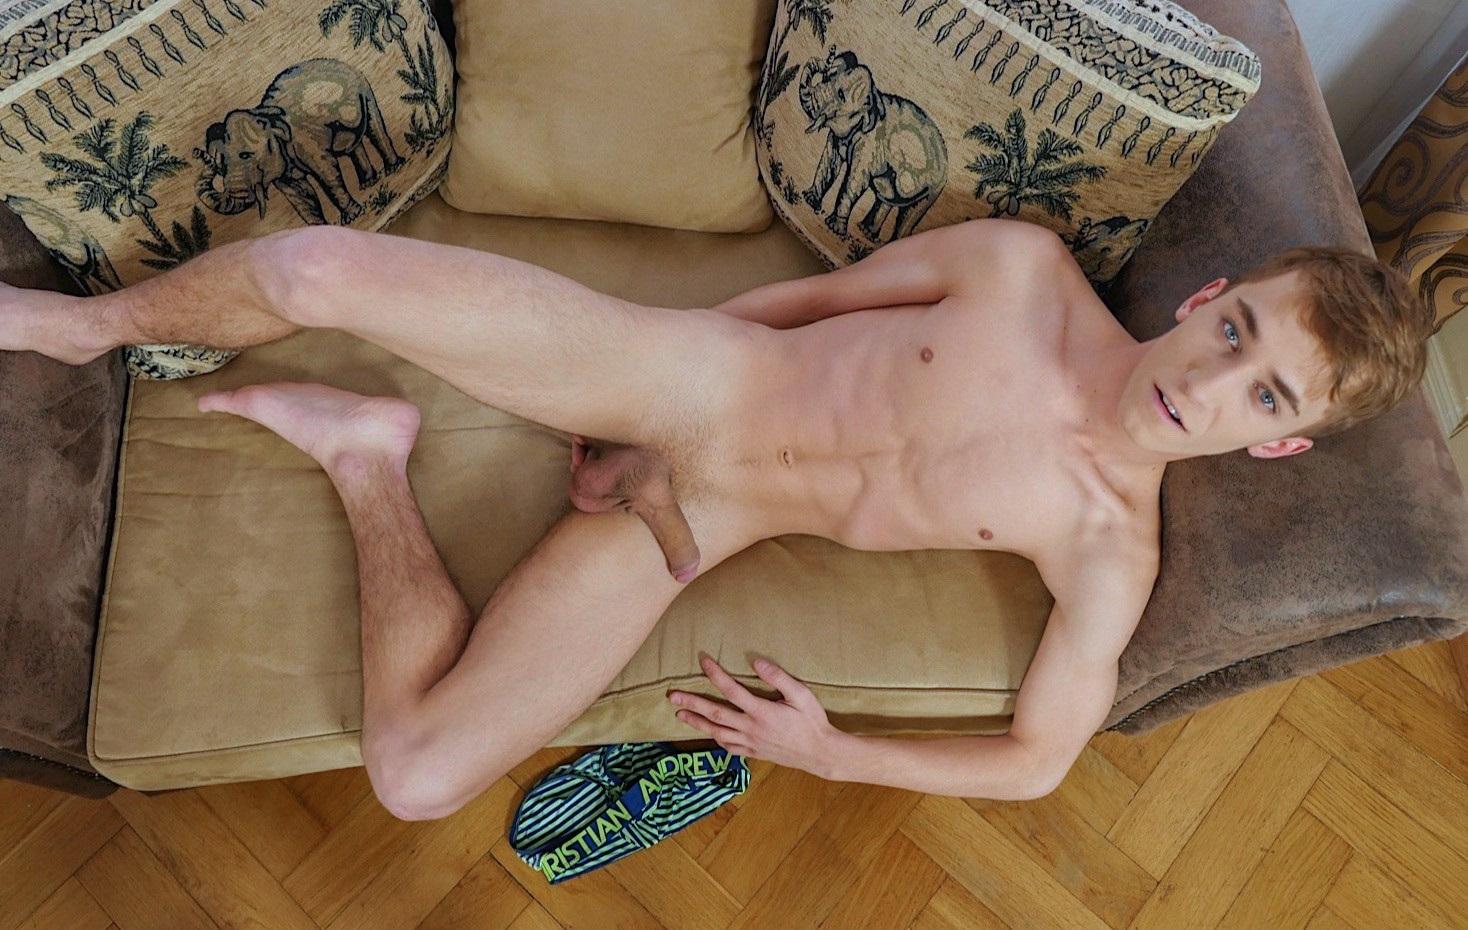 Cute nude boy with a big uncut cock